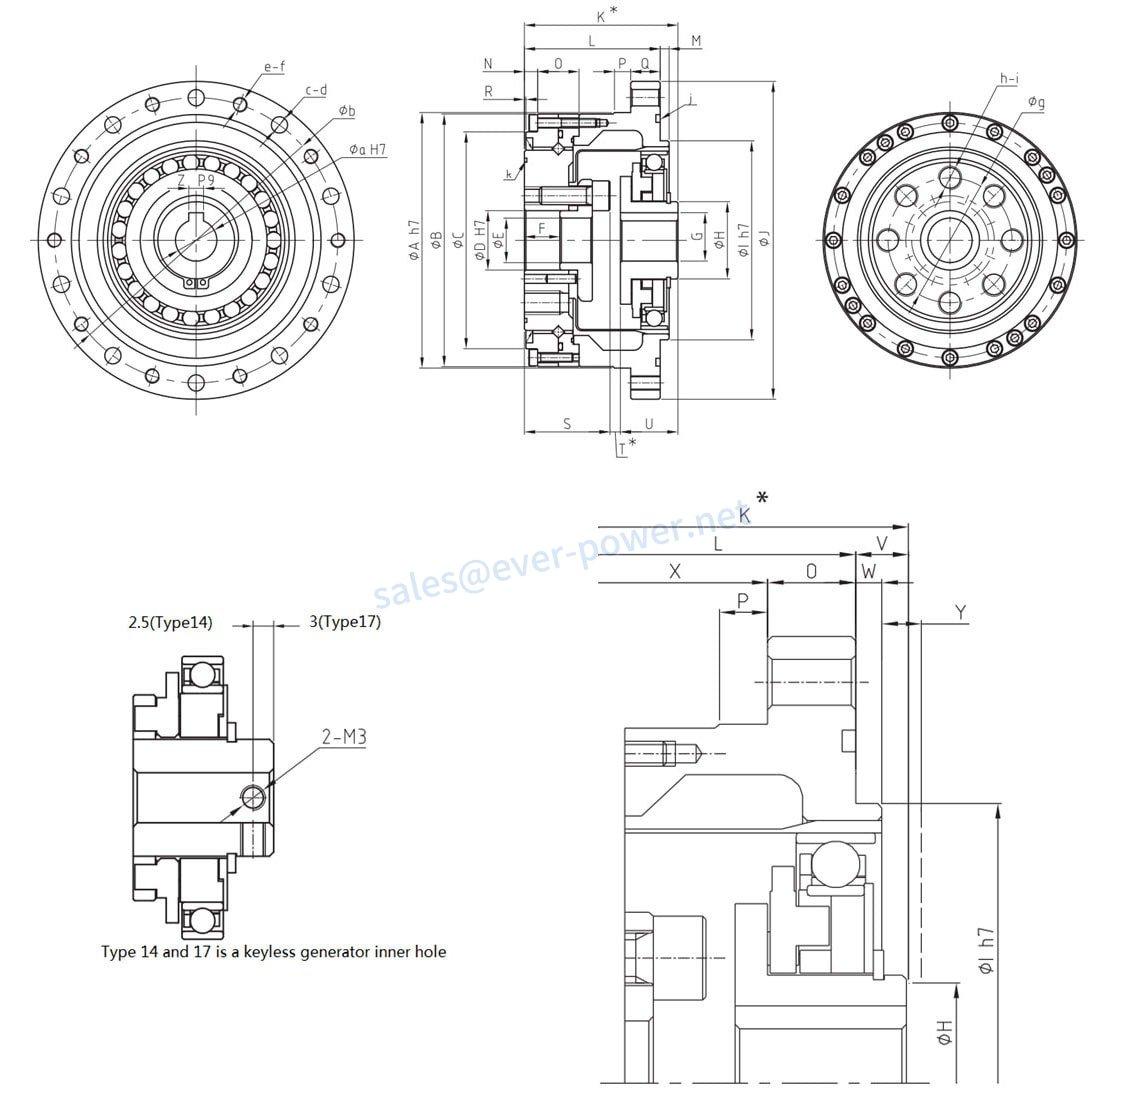 lss-lsn-lsg-II-model-drawing